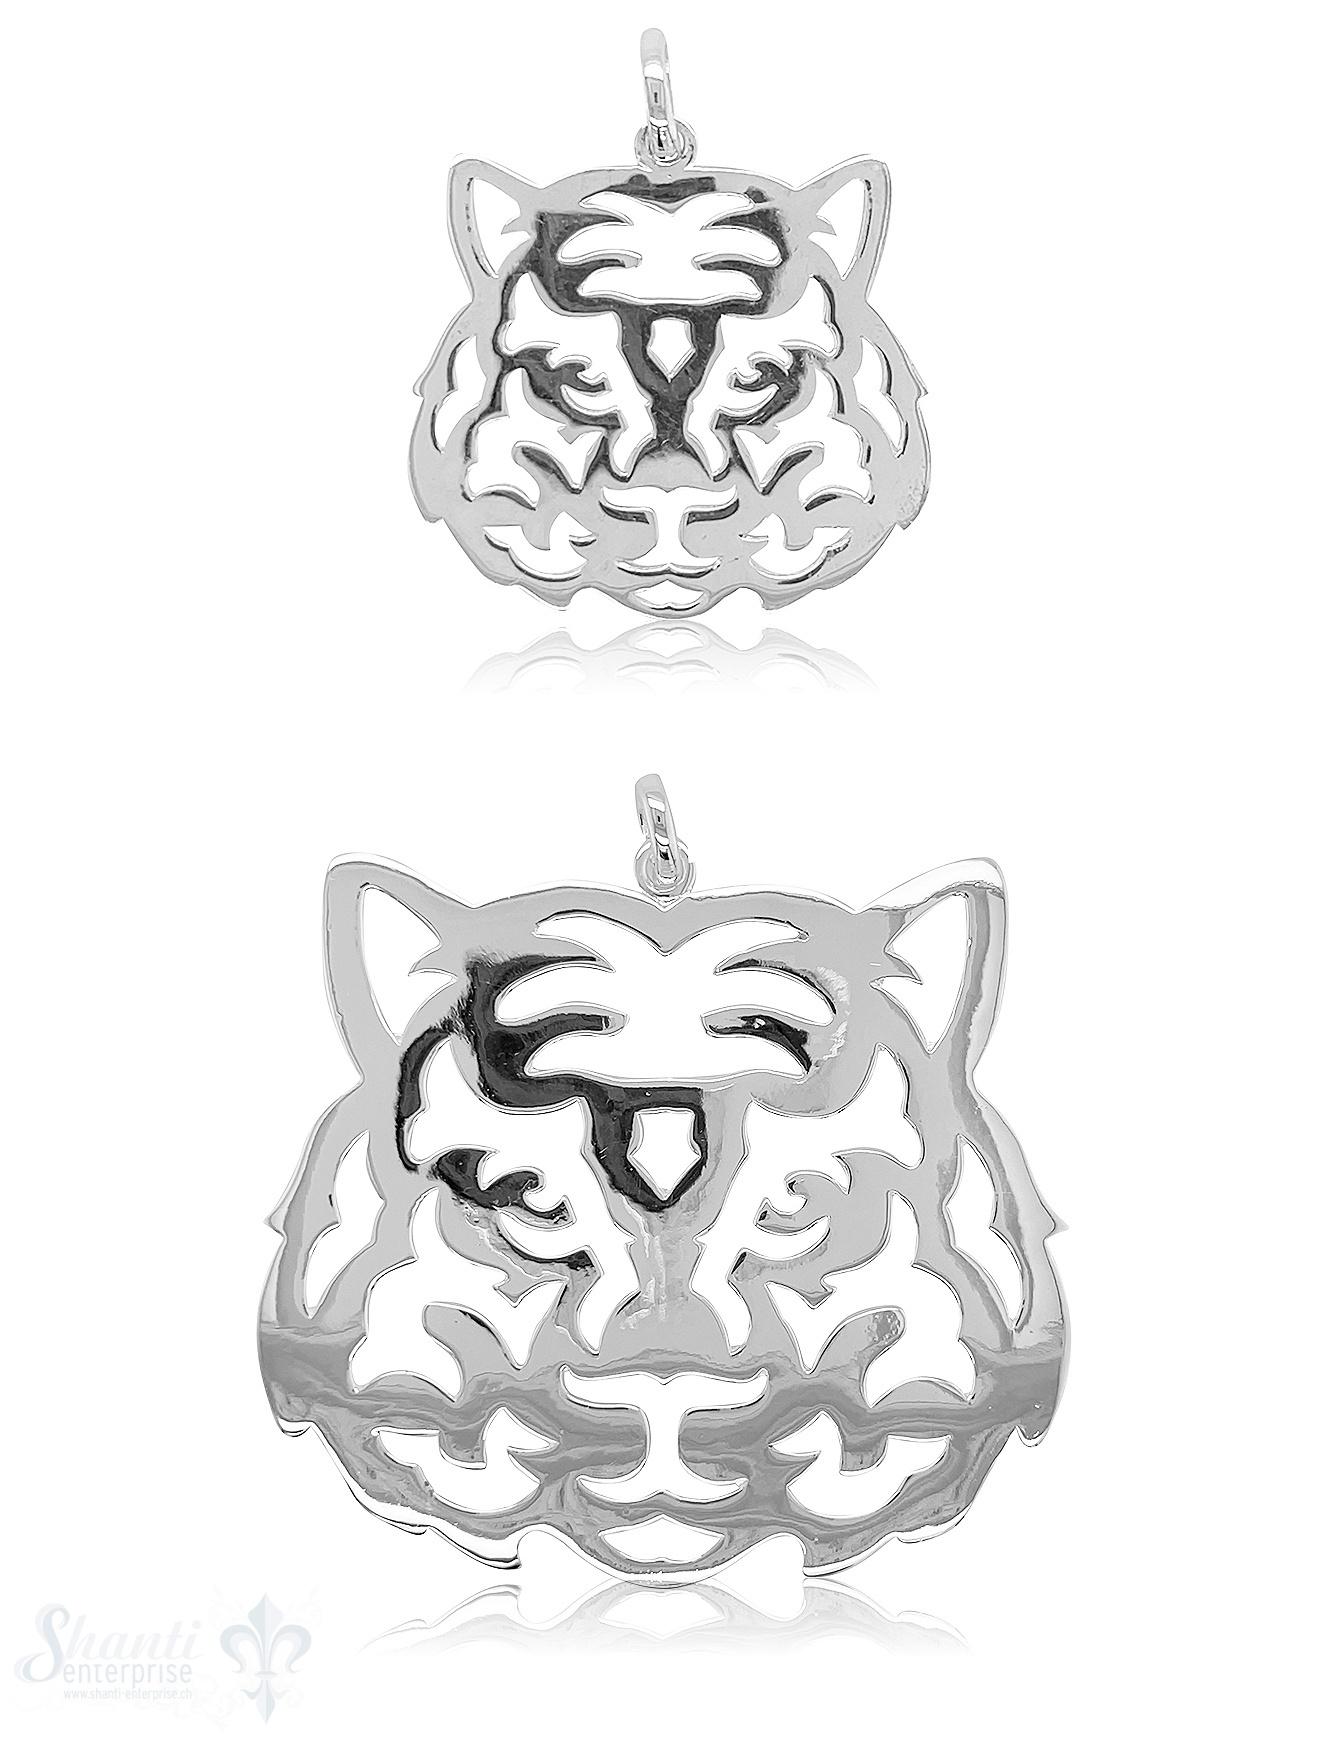 Tiger Anhänger flach Silber hell poliert durchbrochen mit Öse